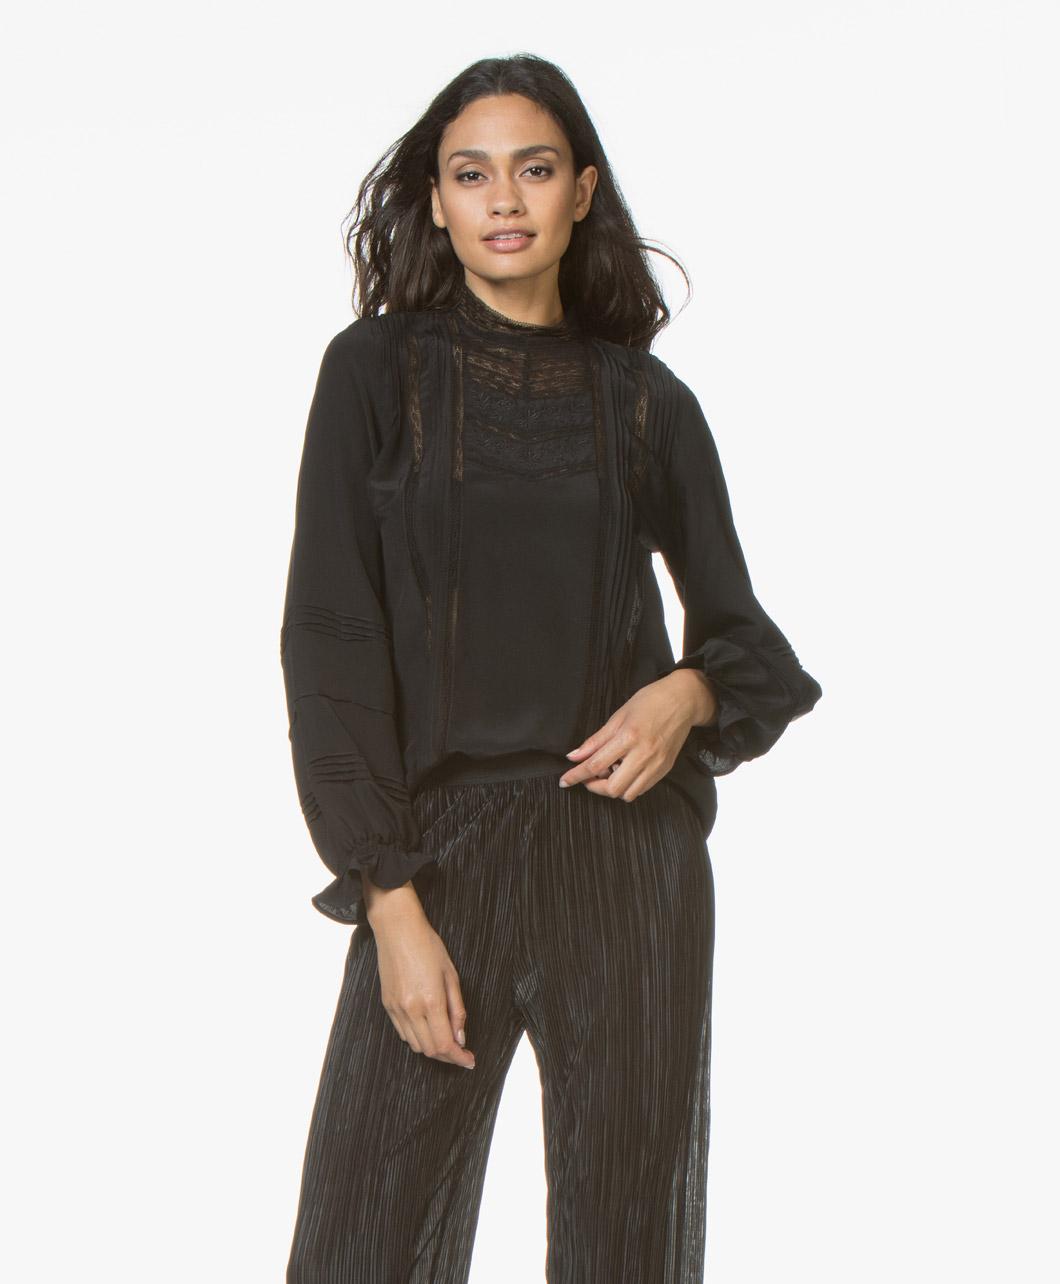 Vanessa Bruno Joia Silk Embroidered Blouse Black 8hva81 V09004 999 Noir